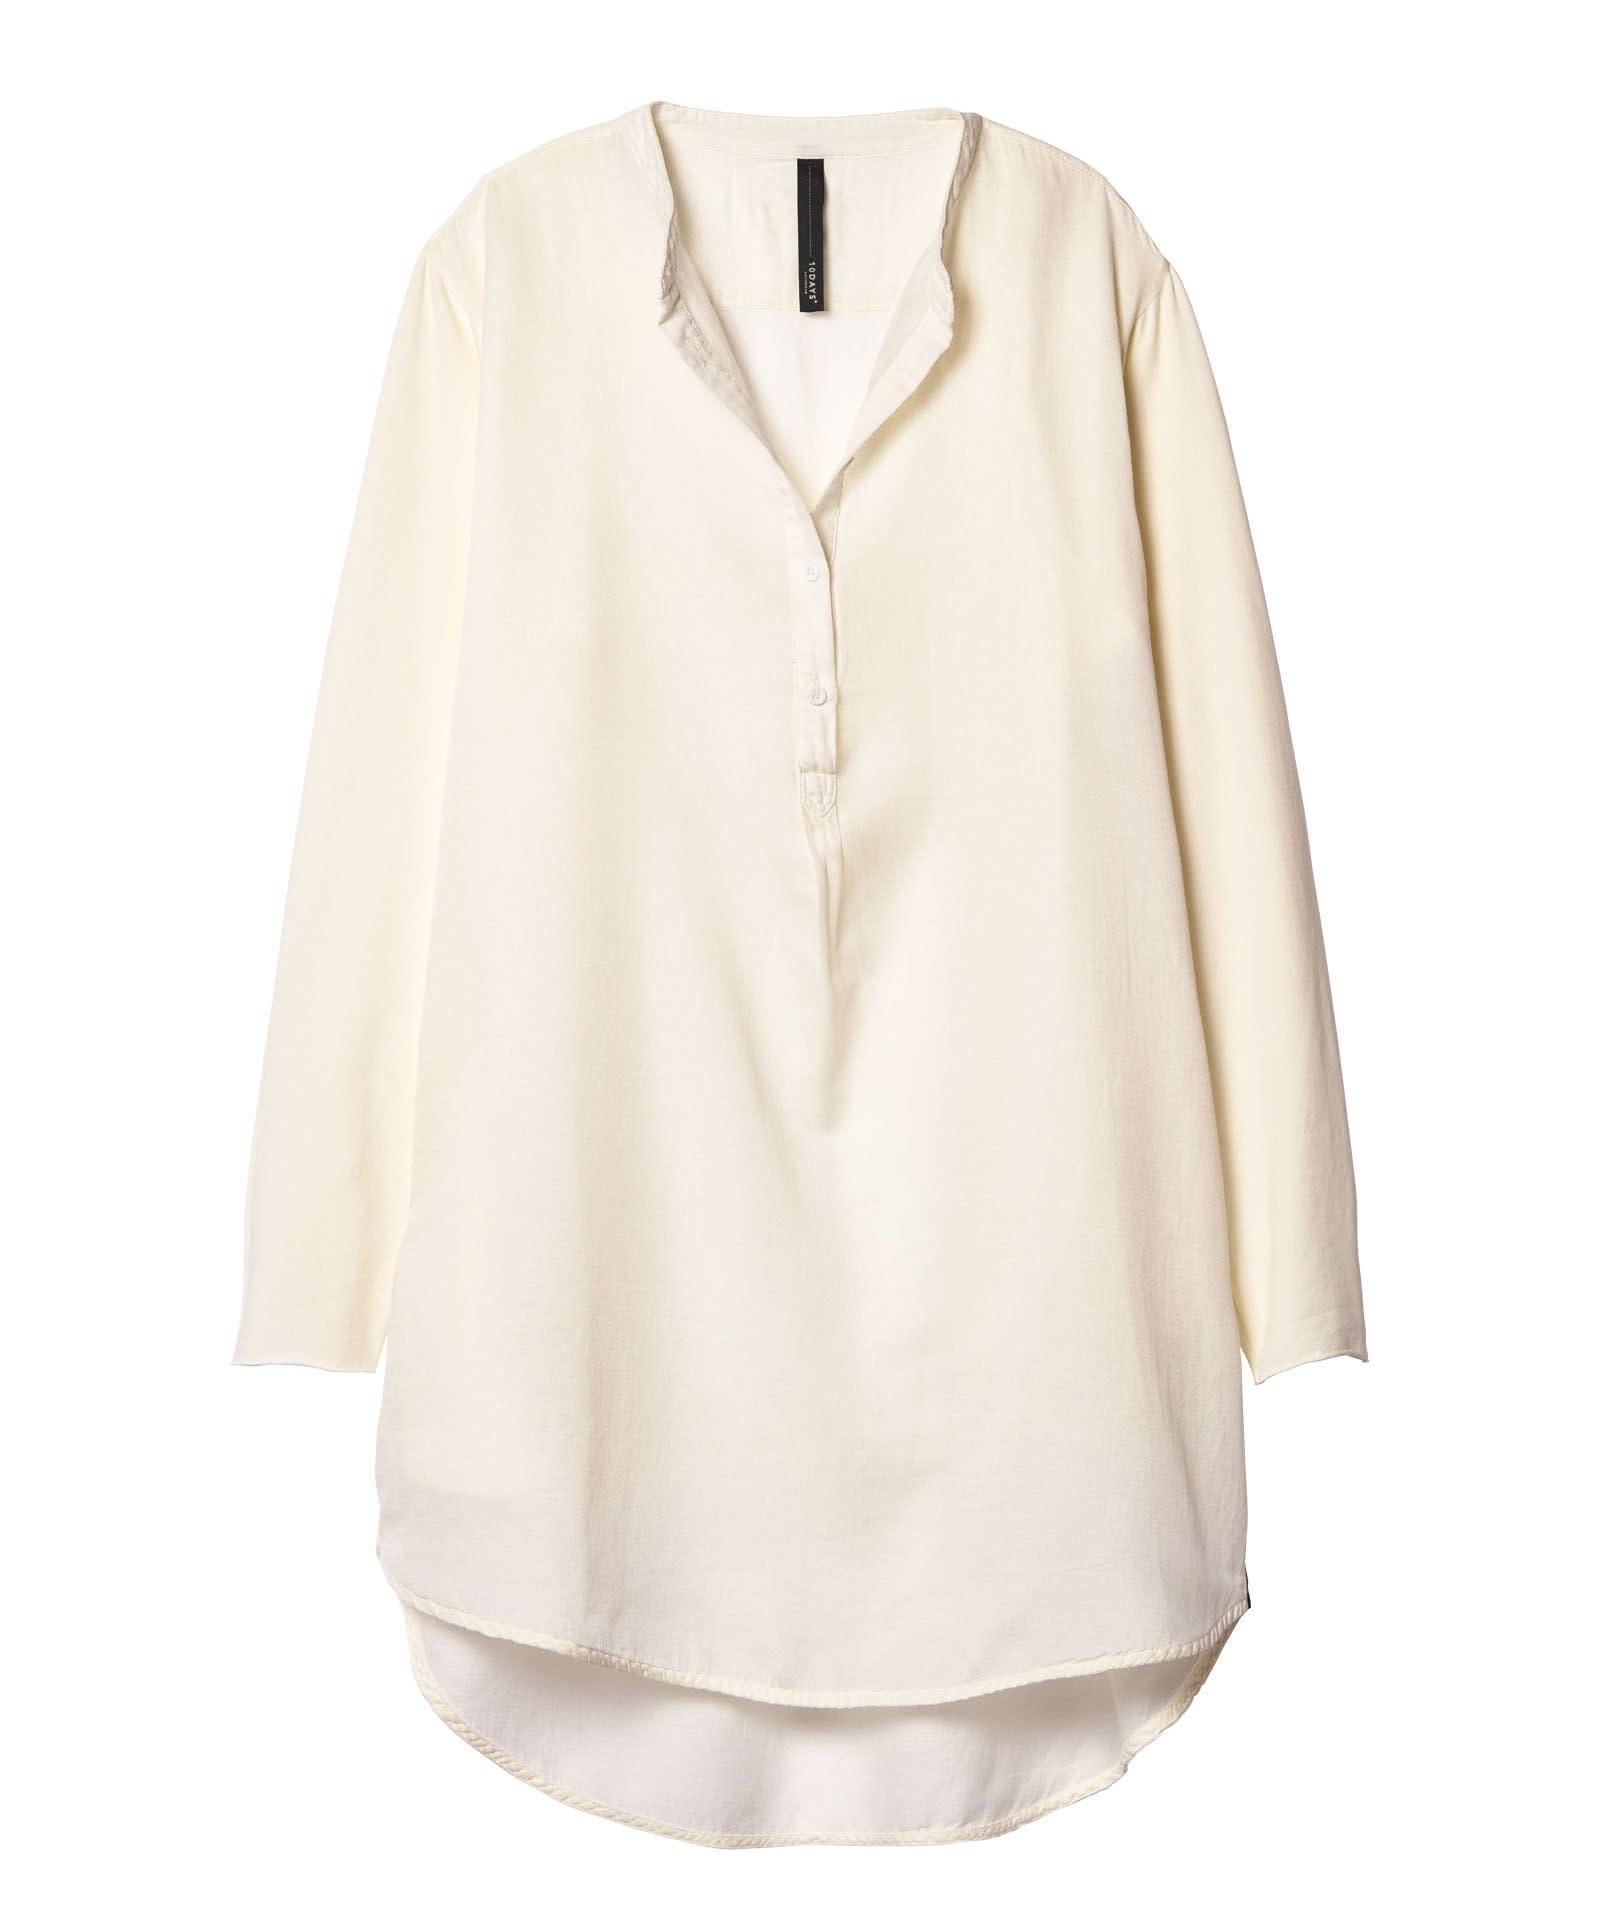 Blouse tunic silk white-1